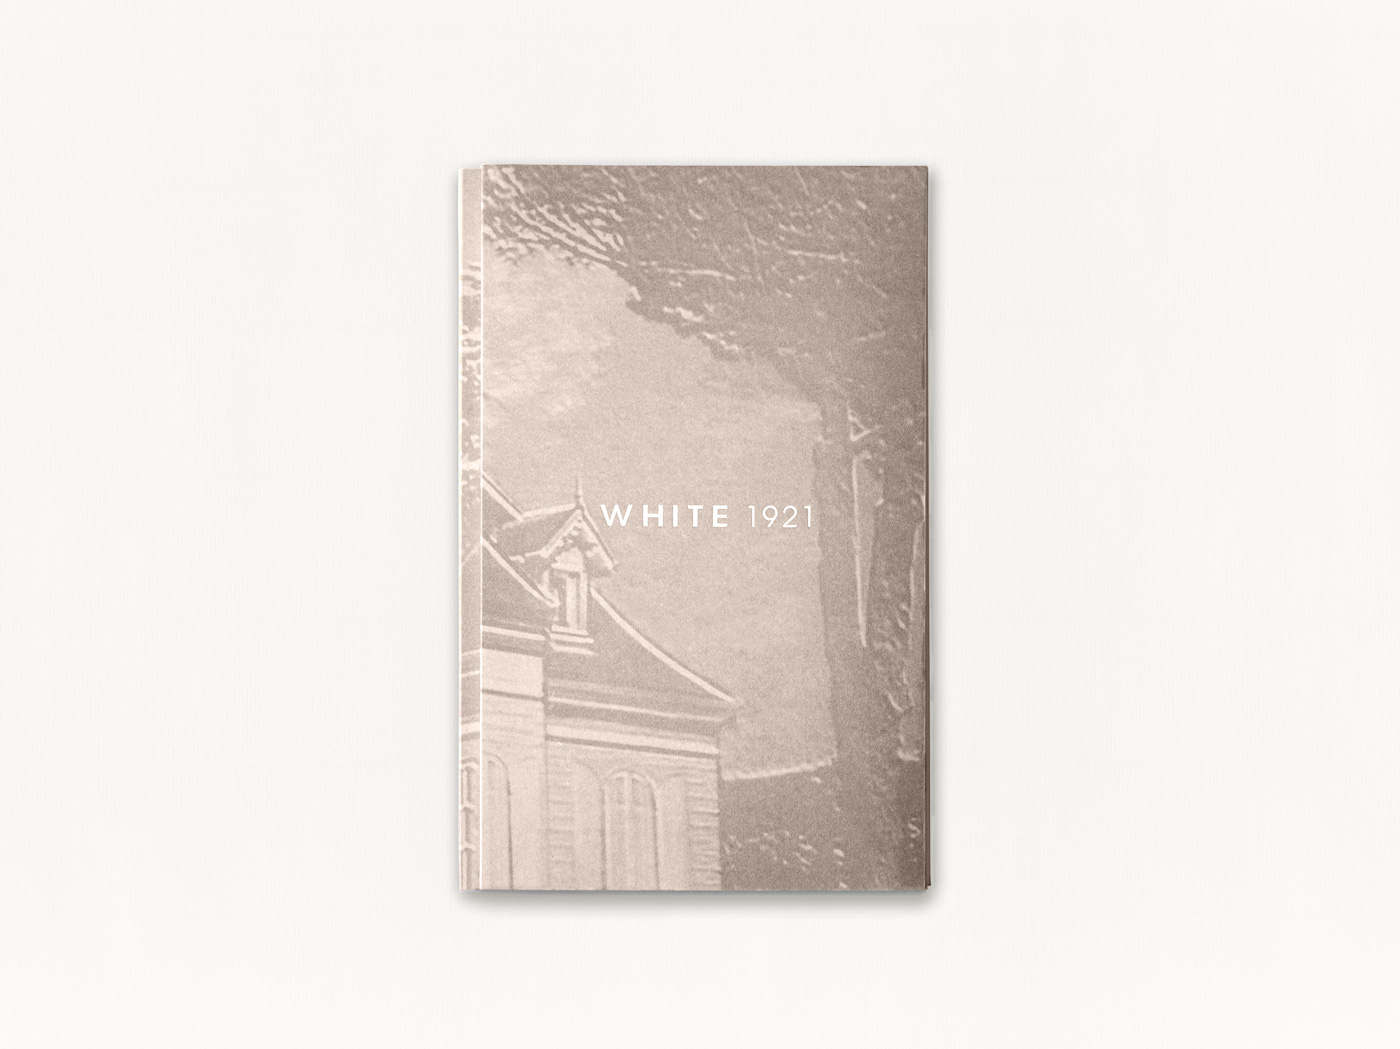 White 1921